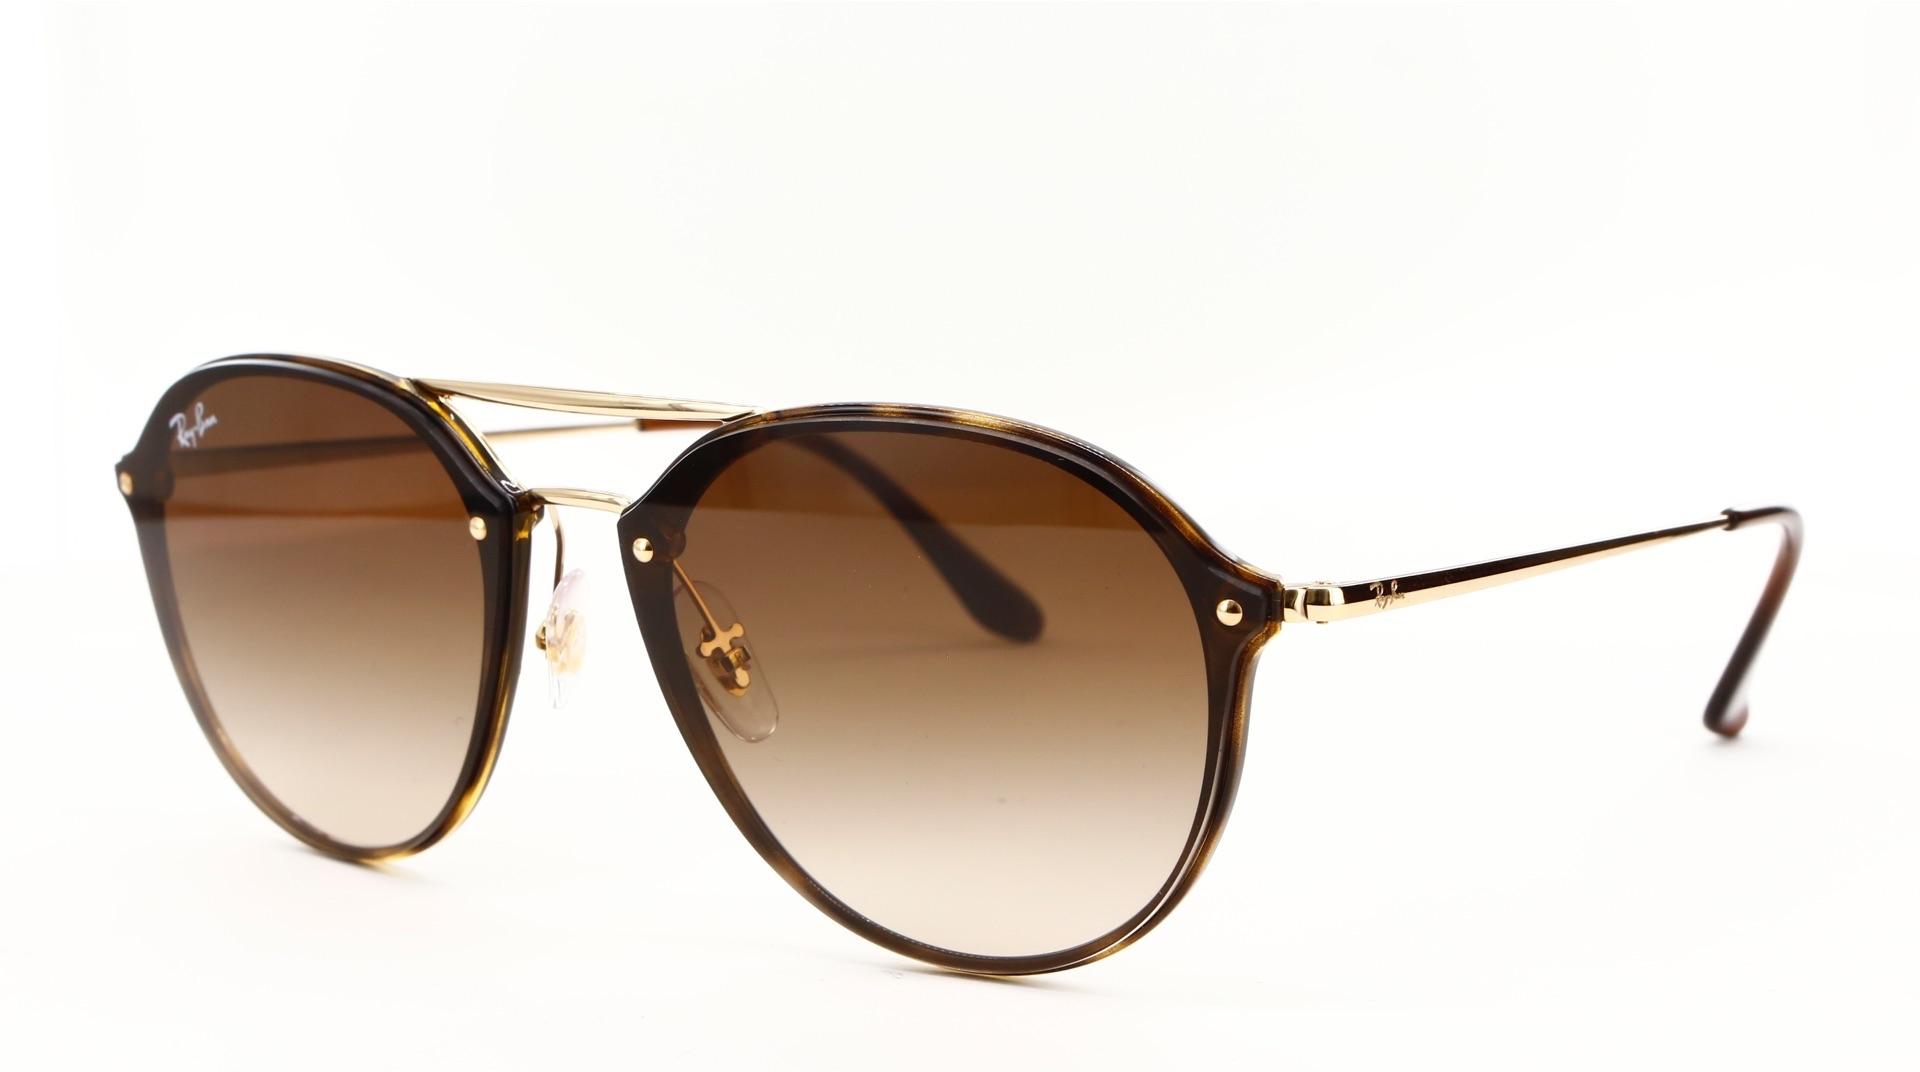 779256db7ebc Ray-Ban sunglasses - ref  79120